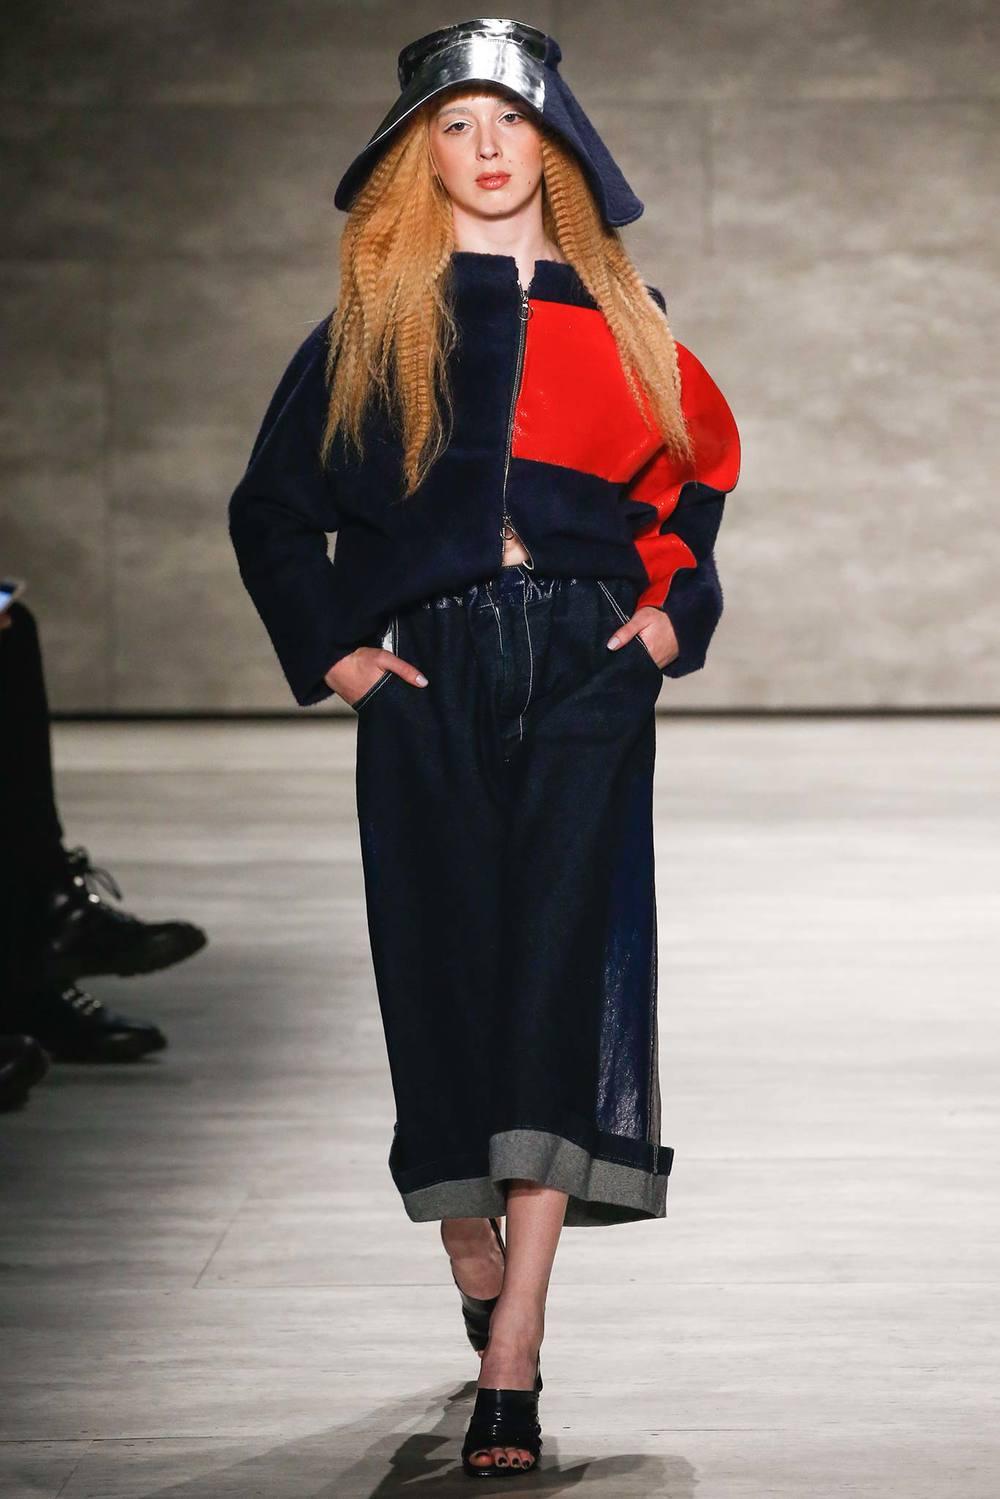 Julia Seeman  photo: Gianni Pucci for style.com